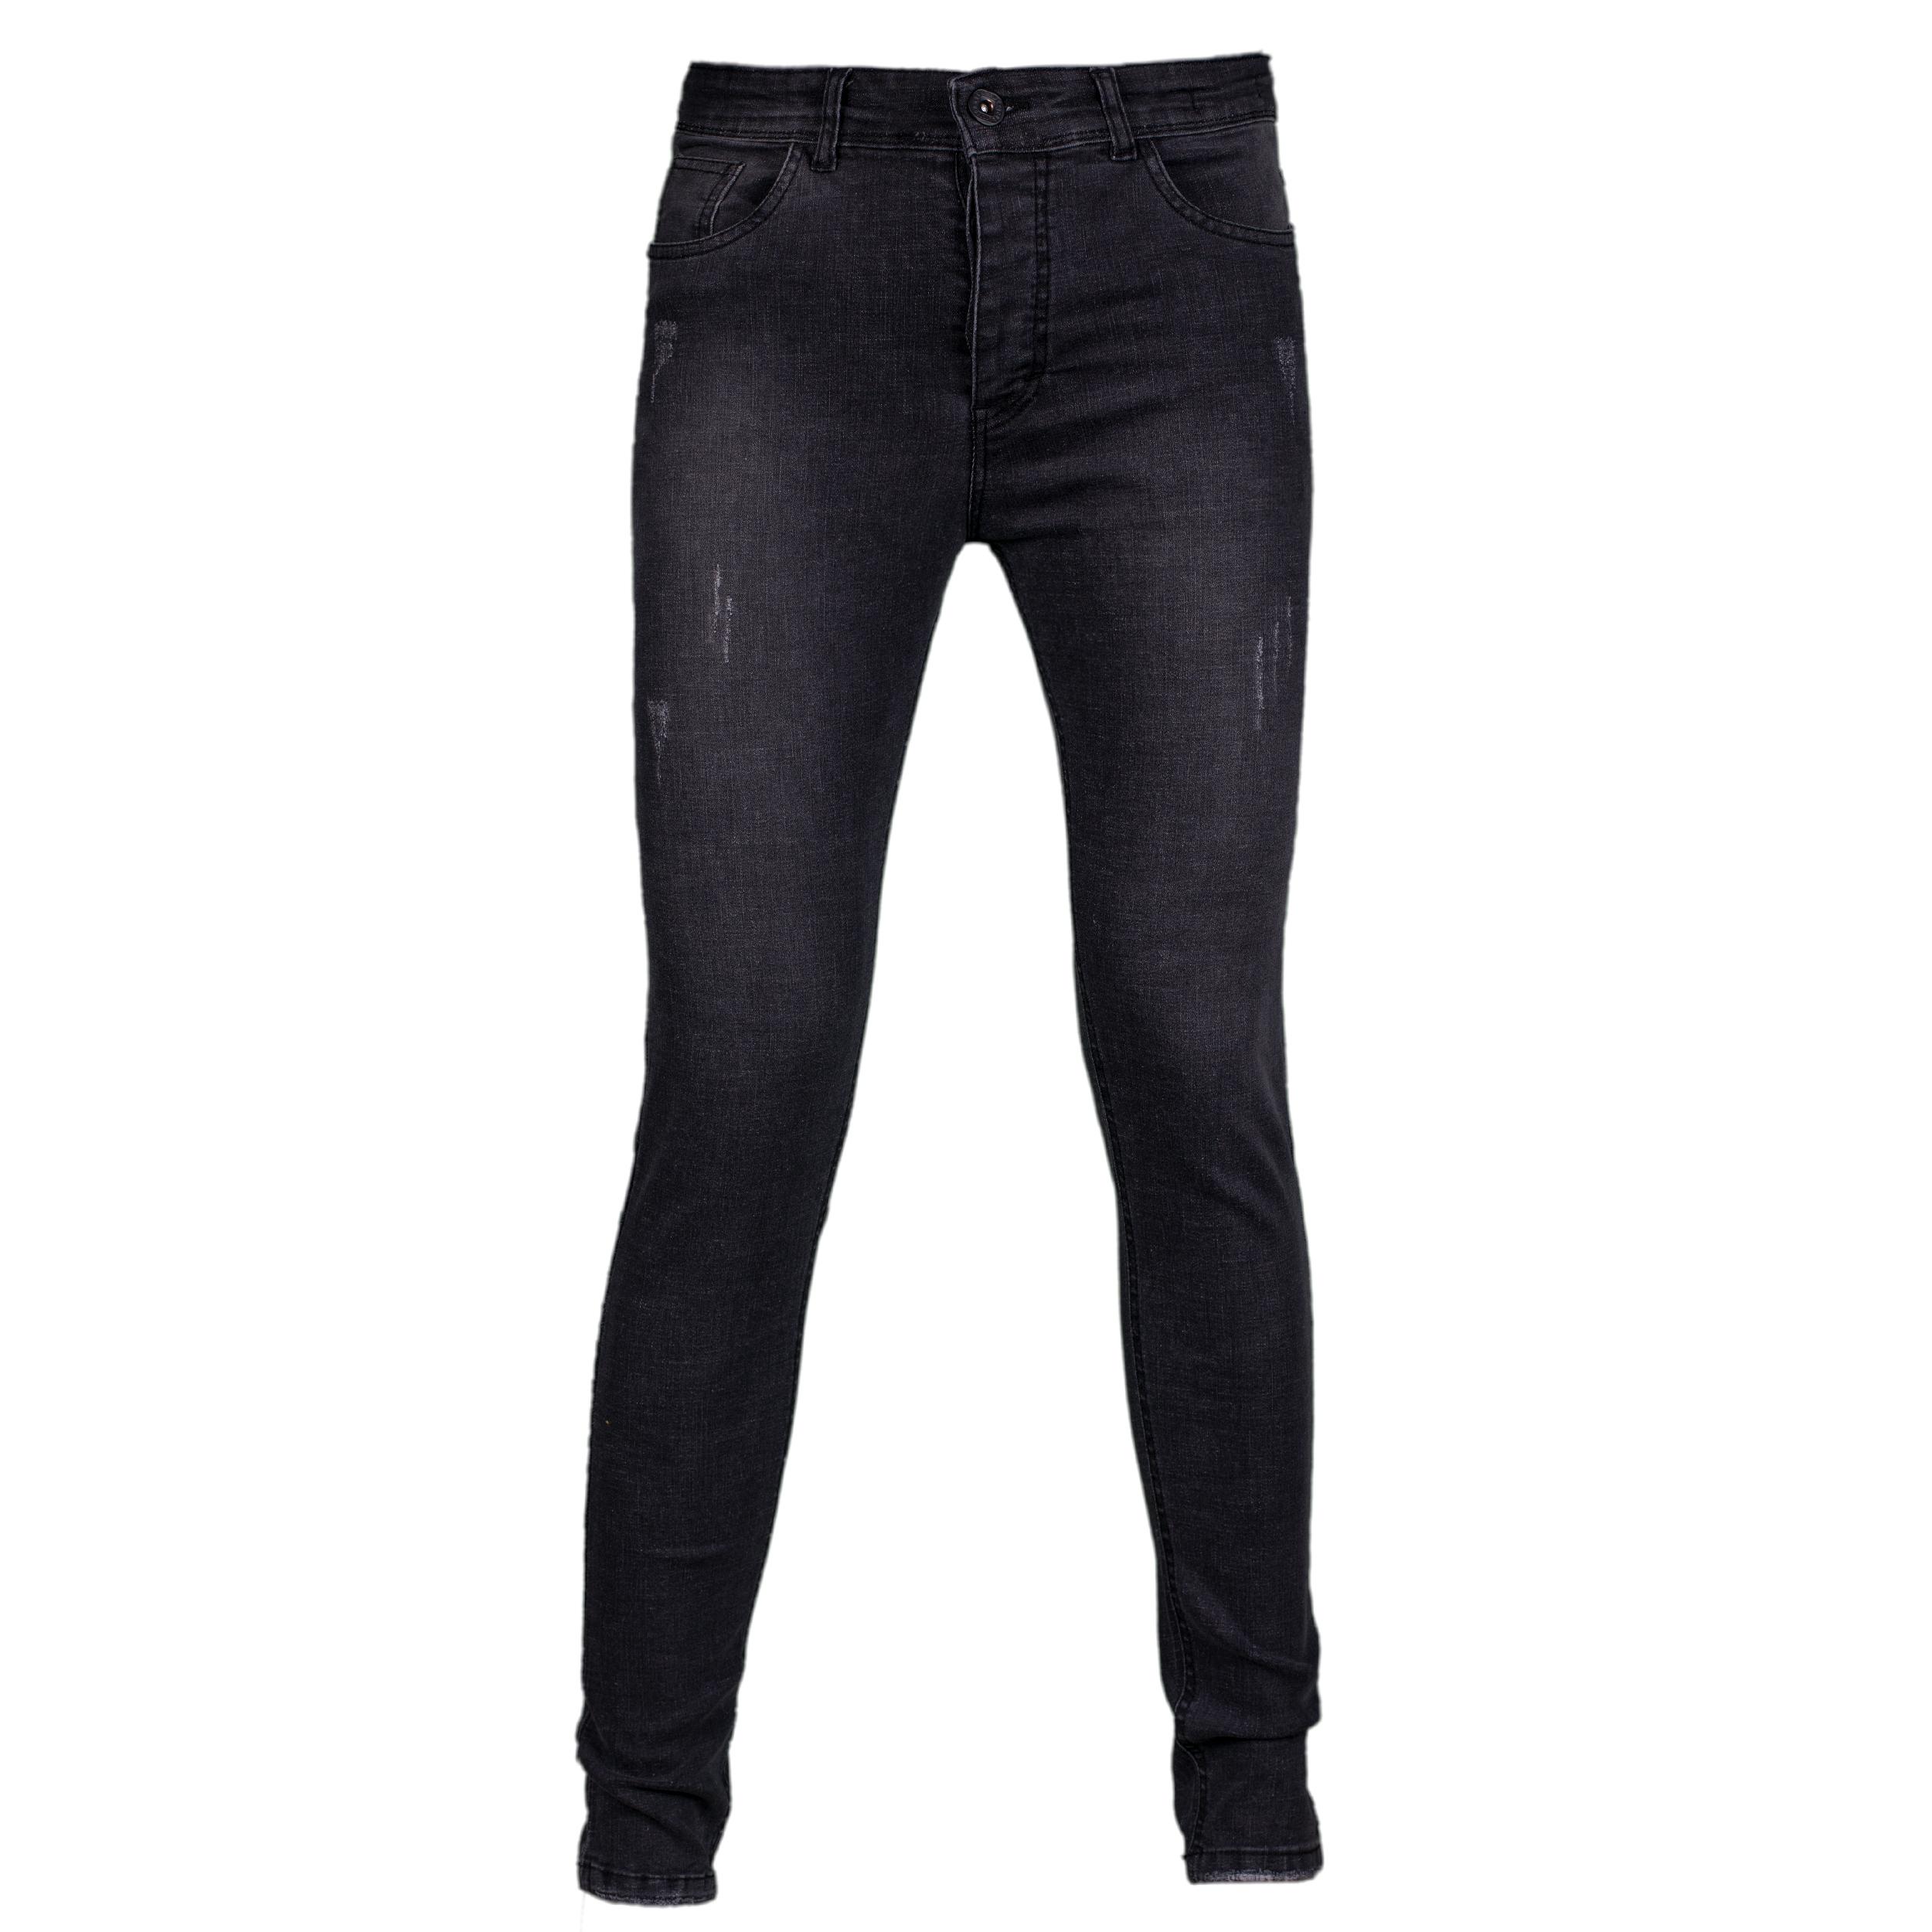 شلوار جین مردانه  کد s13